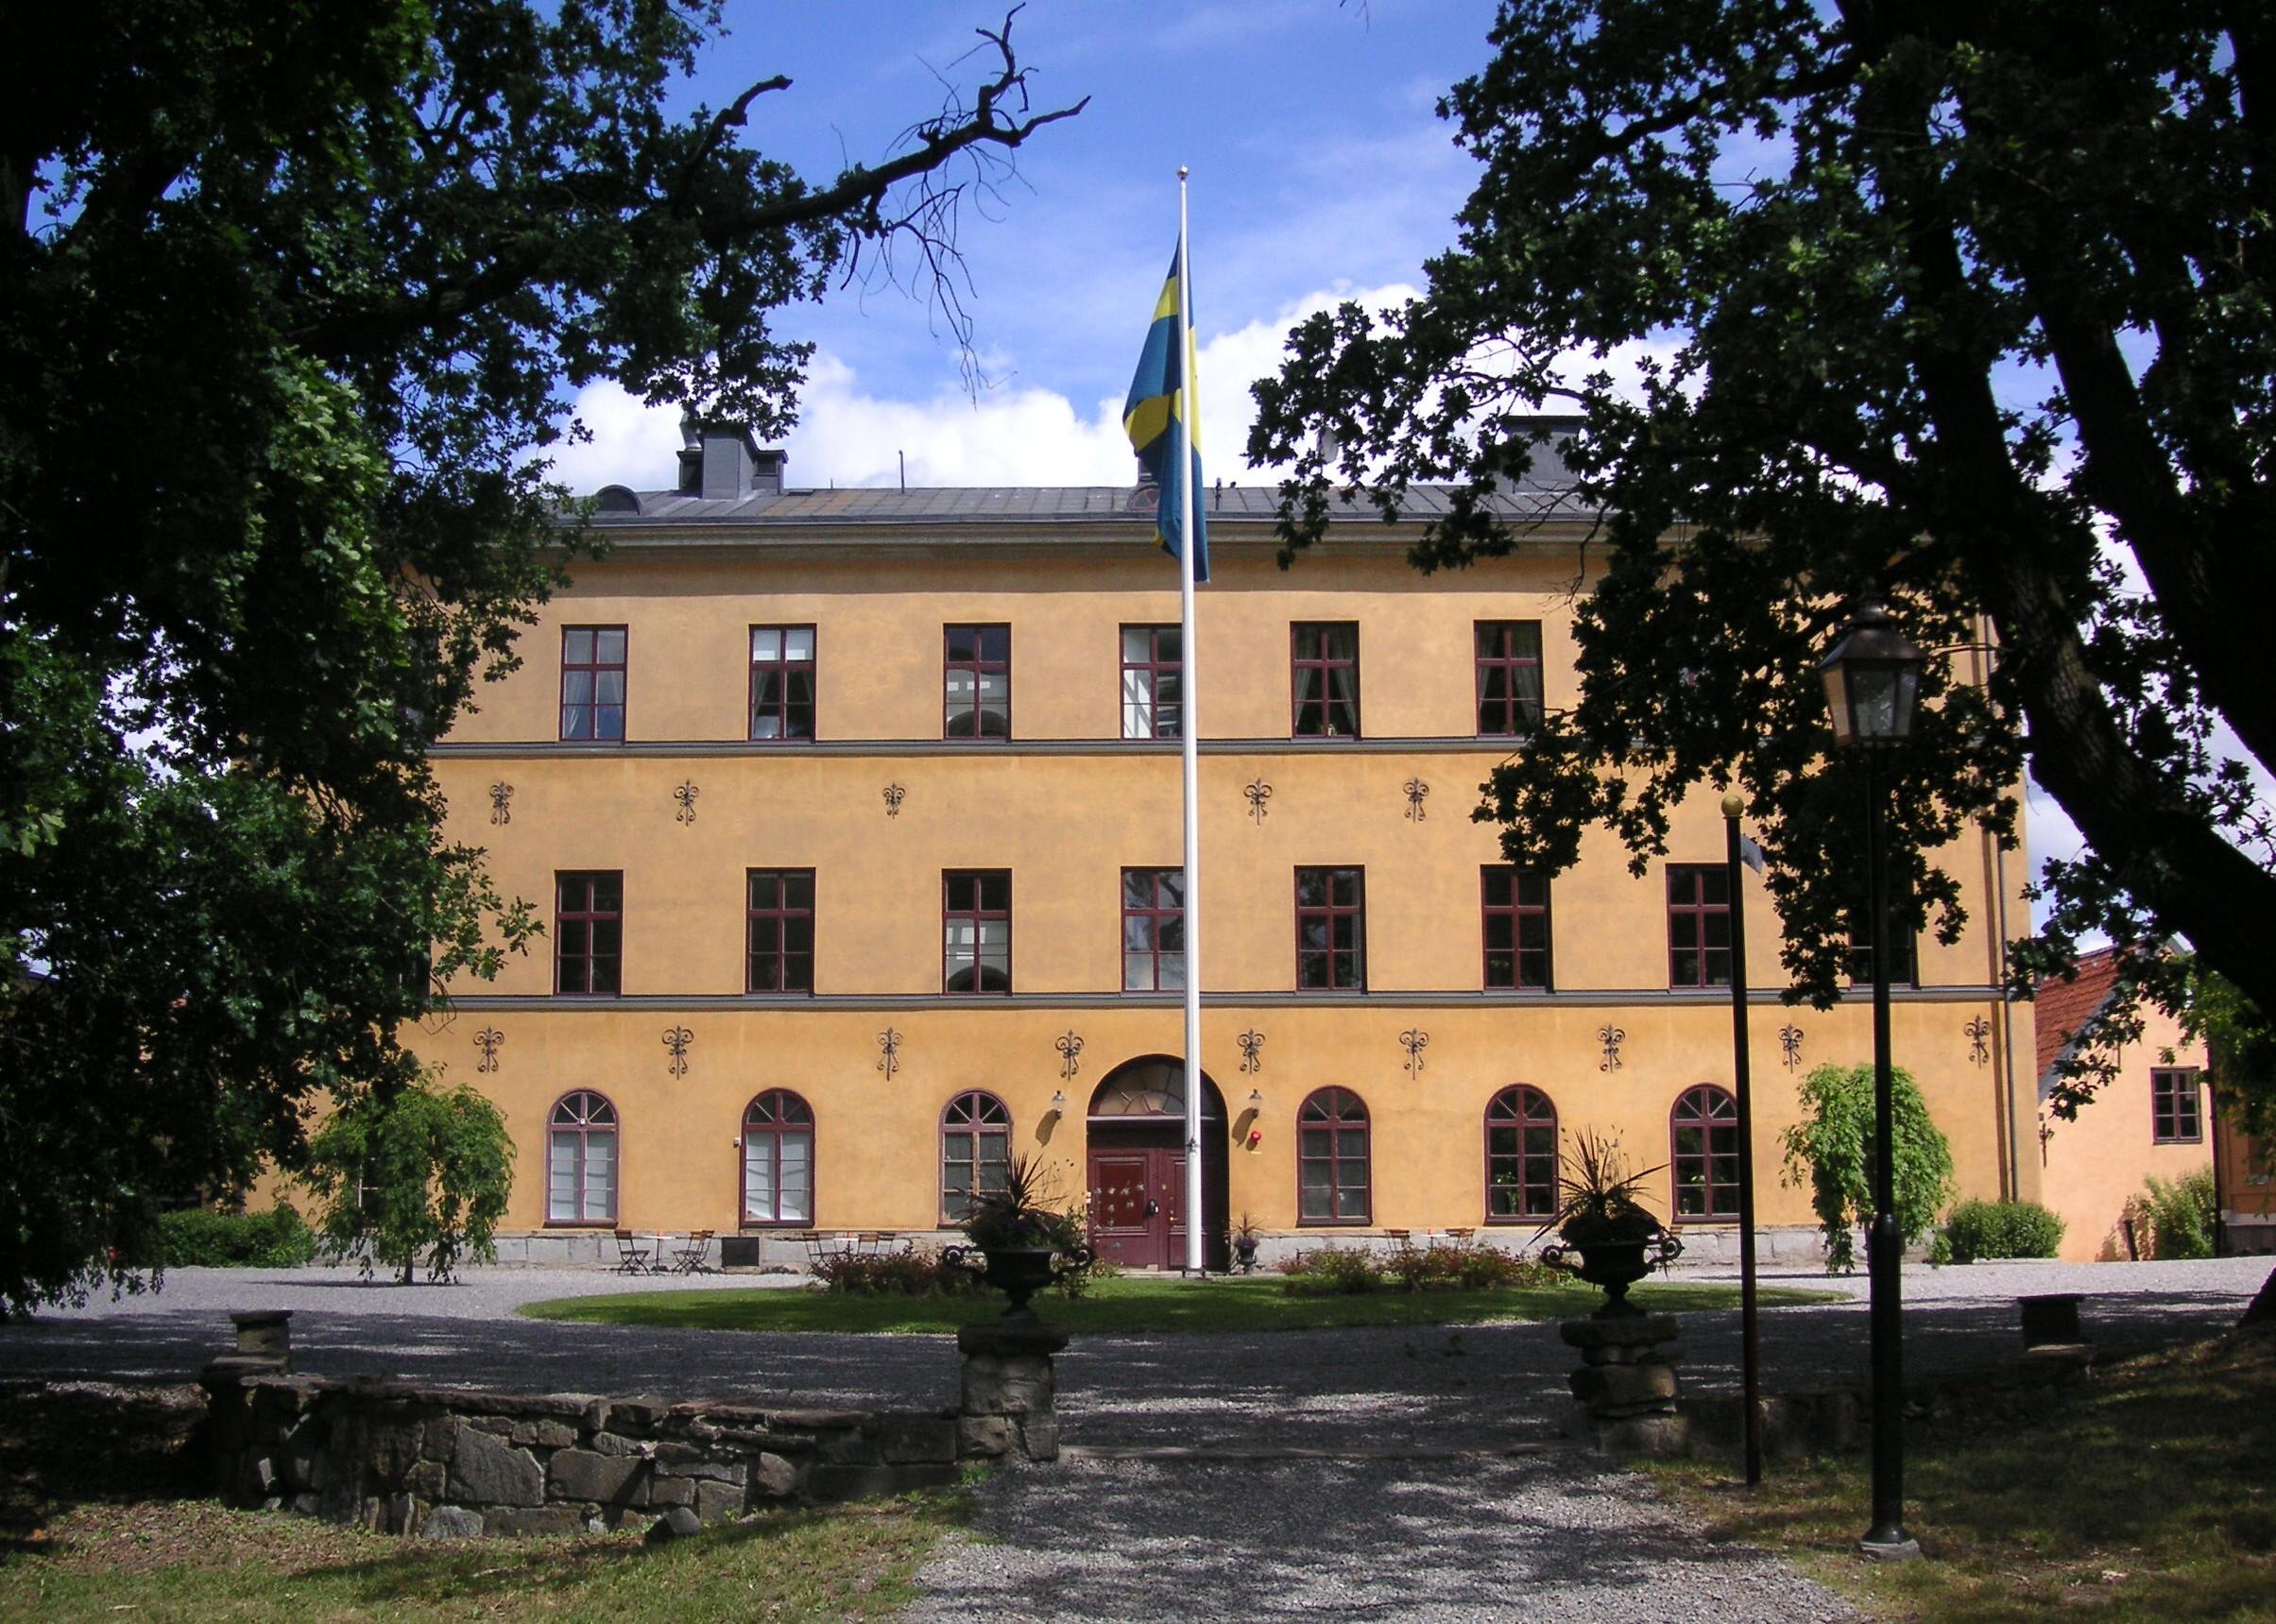 Ulvsunda slott - Wikiwand